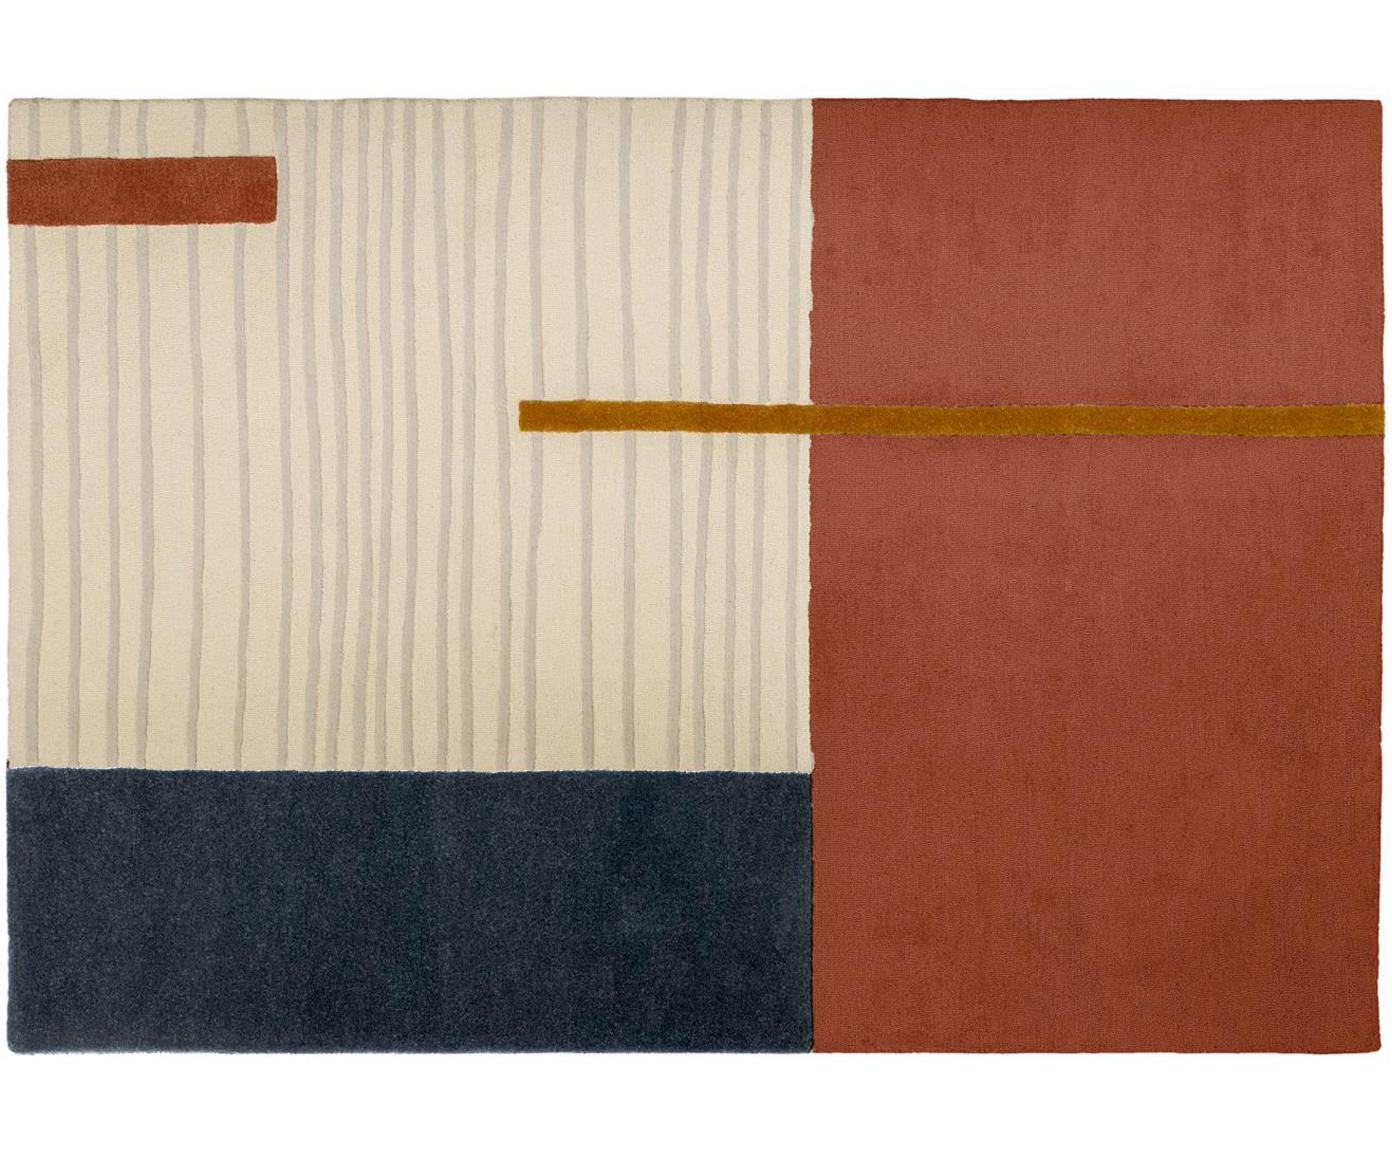 Tappeto Bahiti, Tessuto, Multicolore, Larg. 160 x Lung. 230 cm